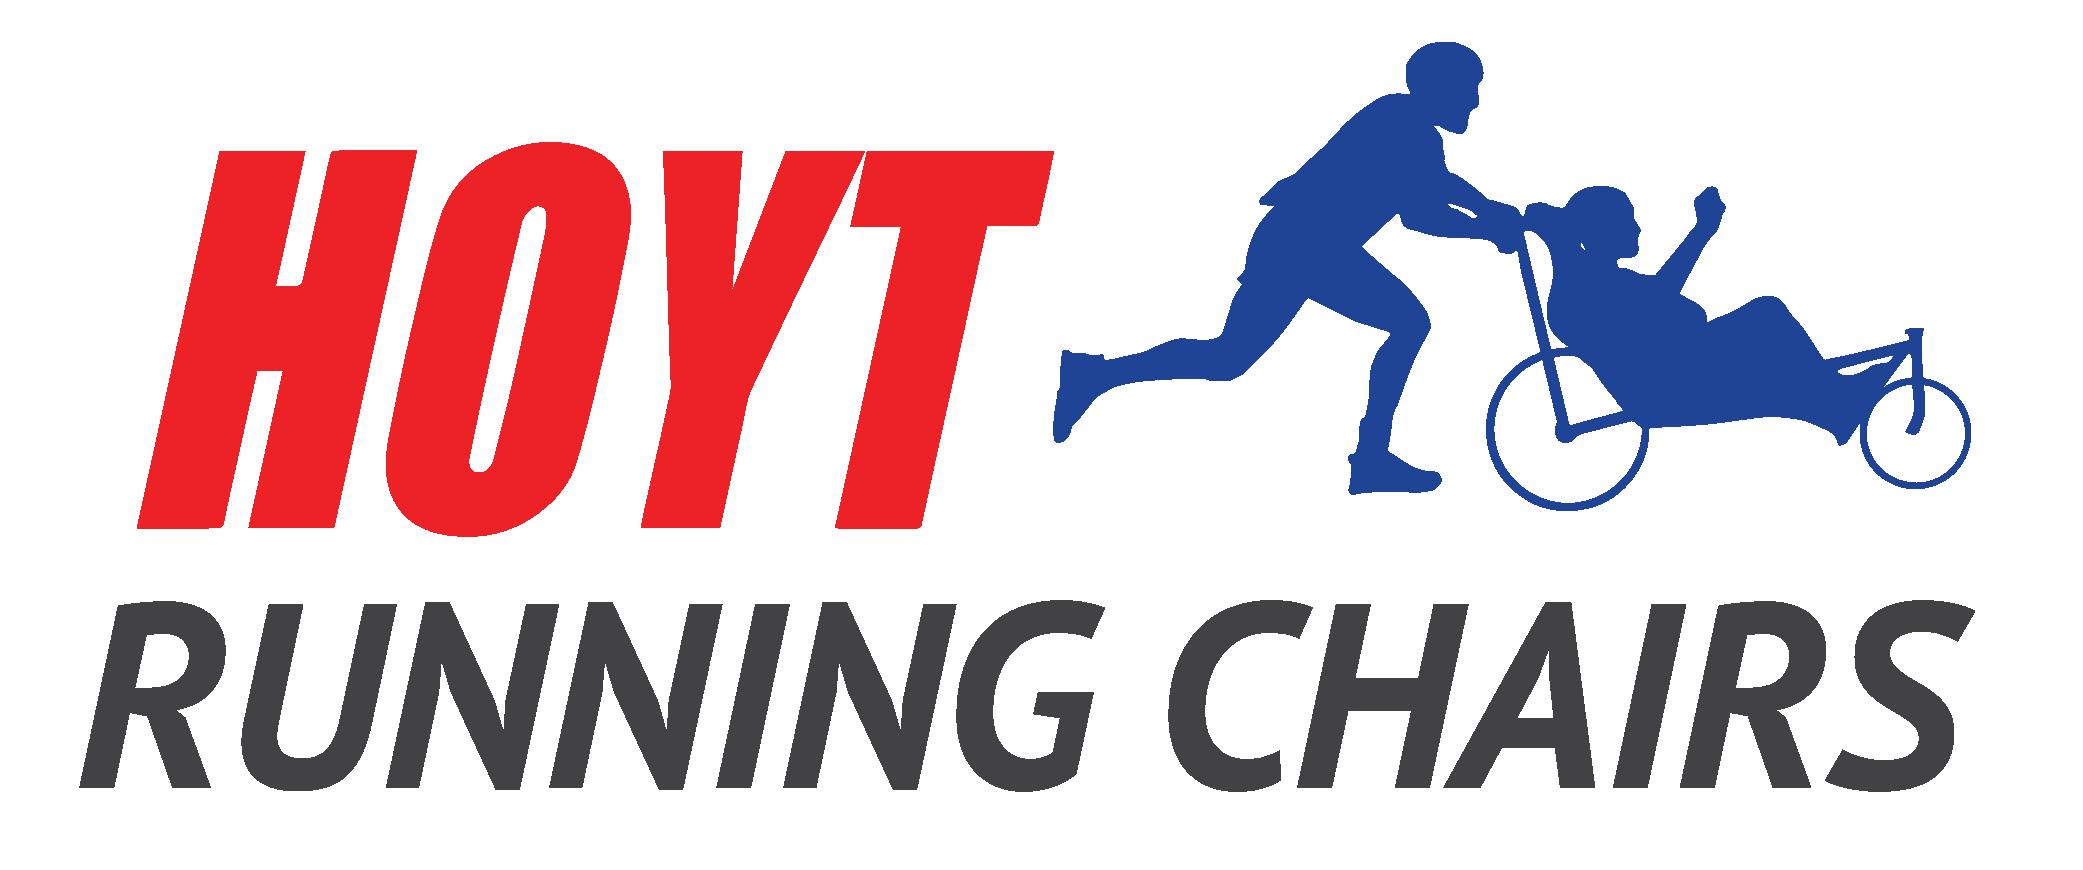 Sponsor Hoyt Running Chairs